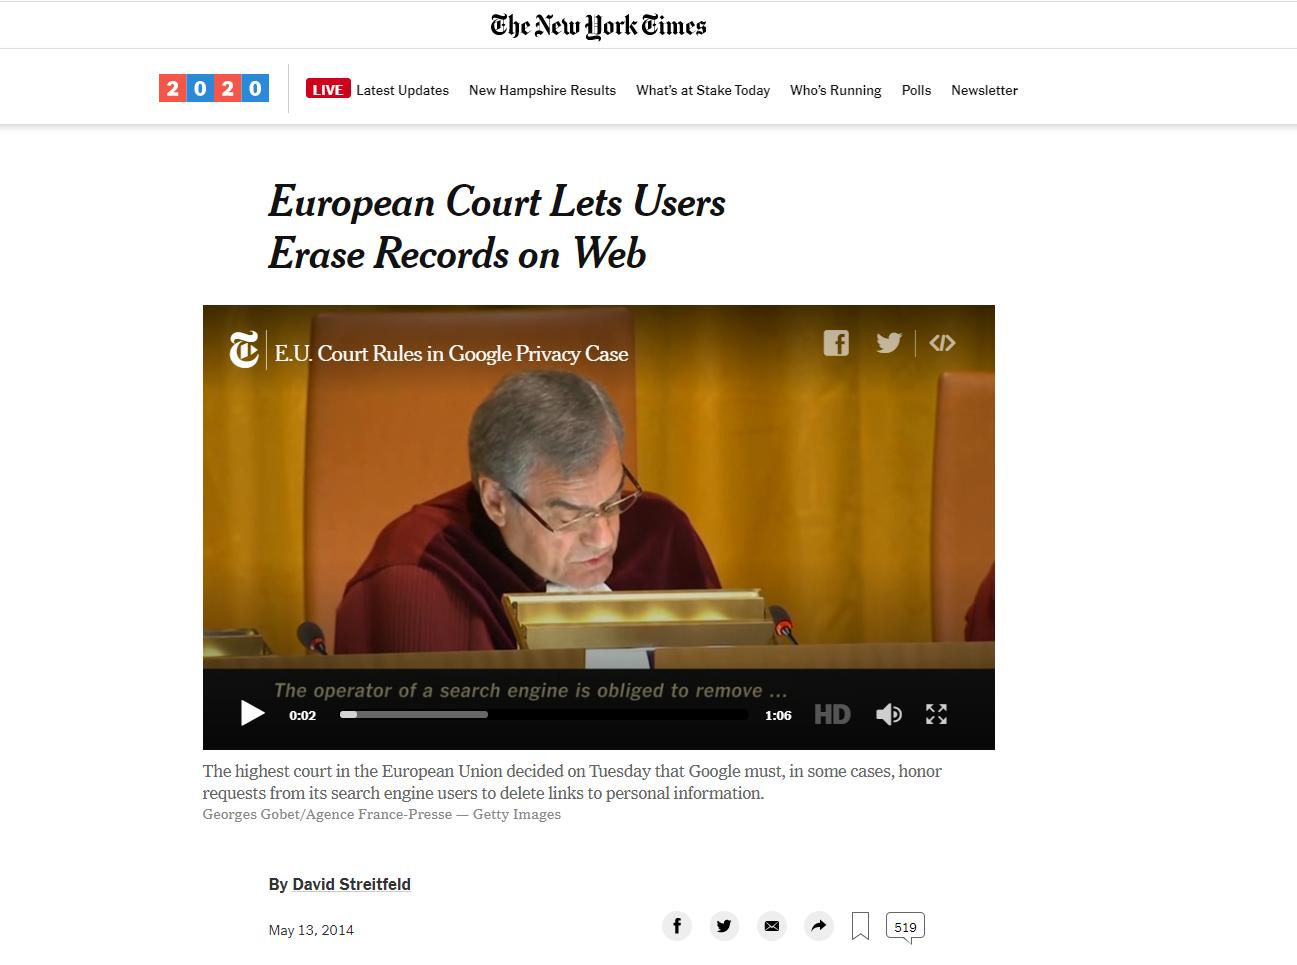 European Court video los usuarios se pronuncian sobre la web New York Times